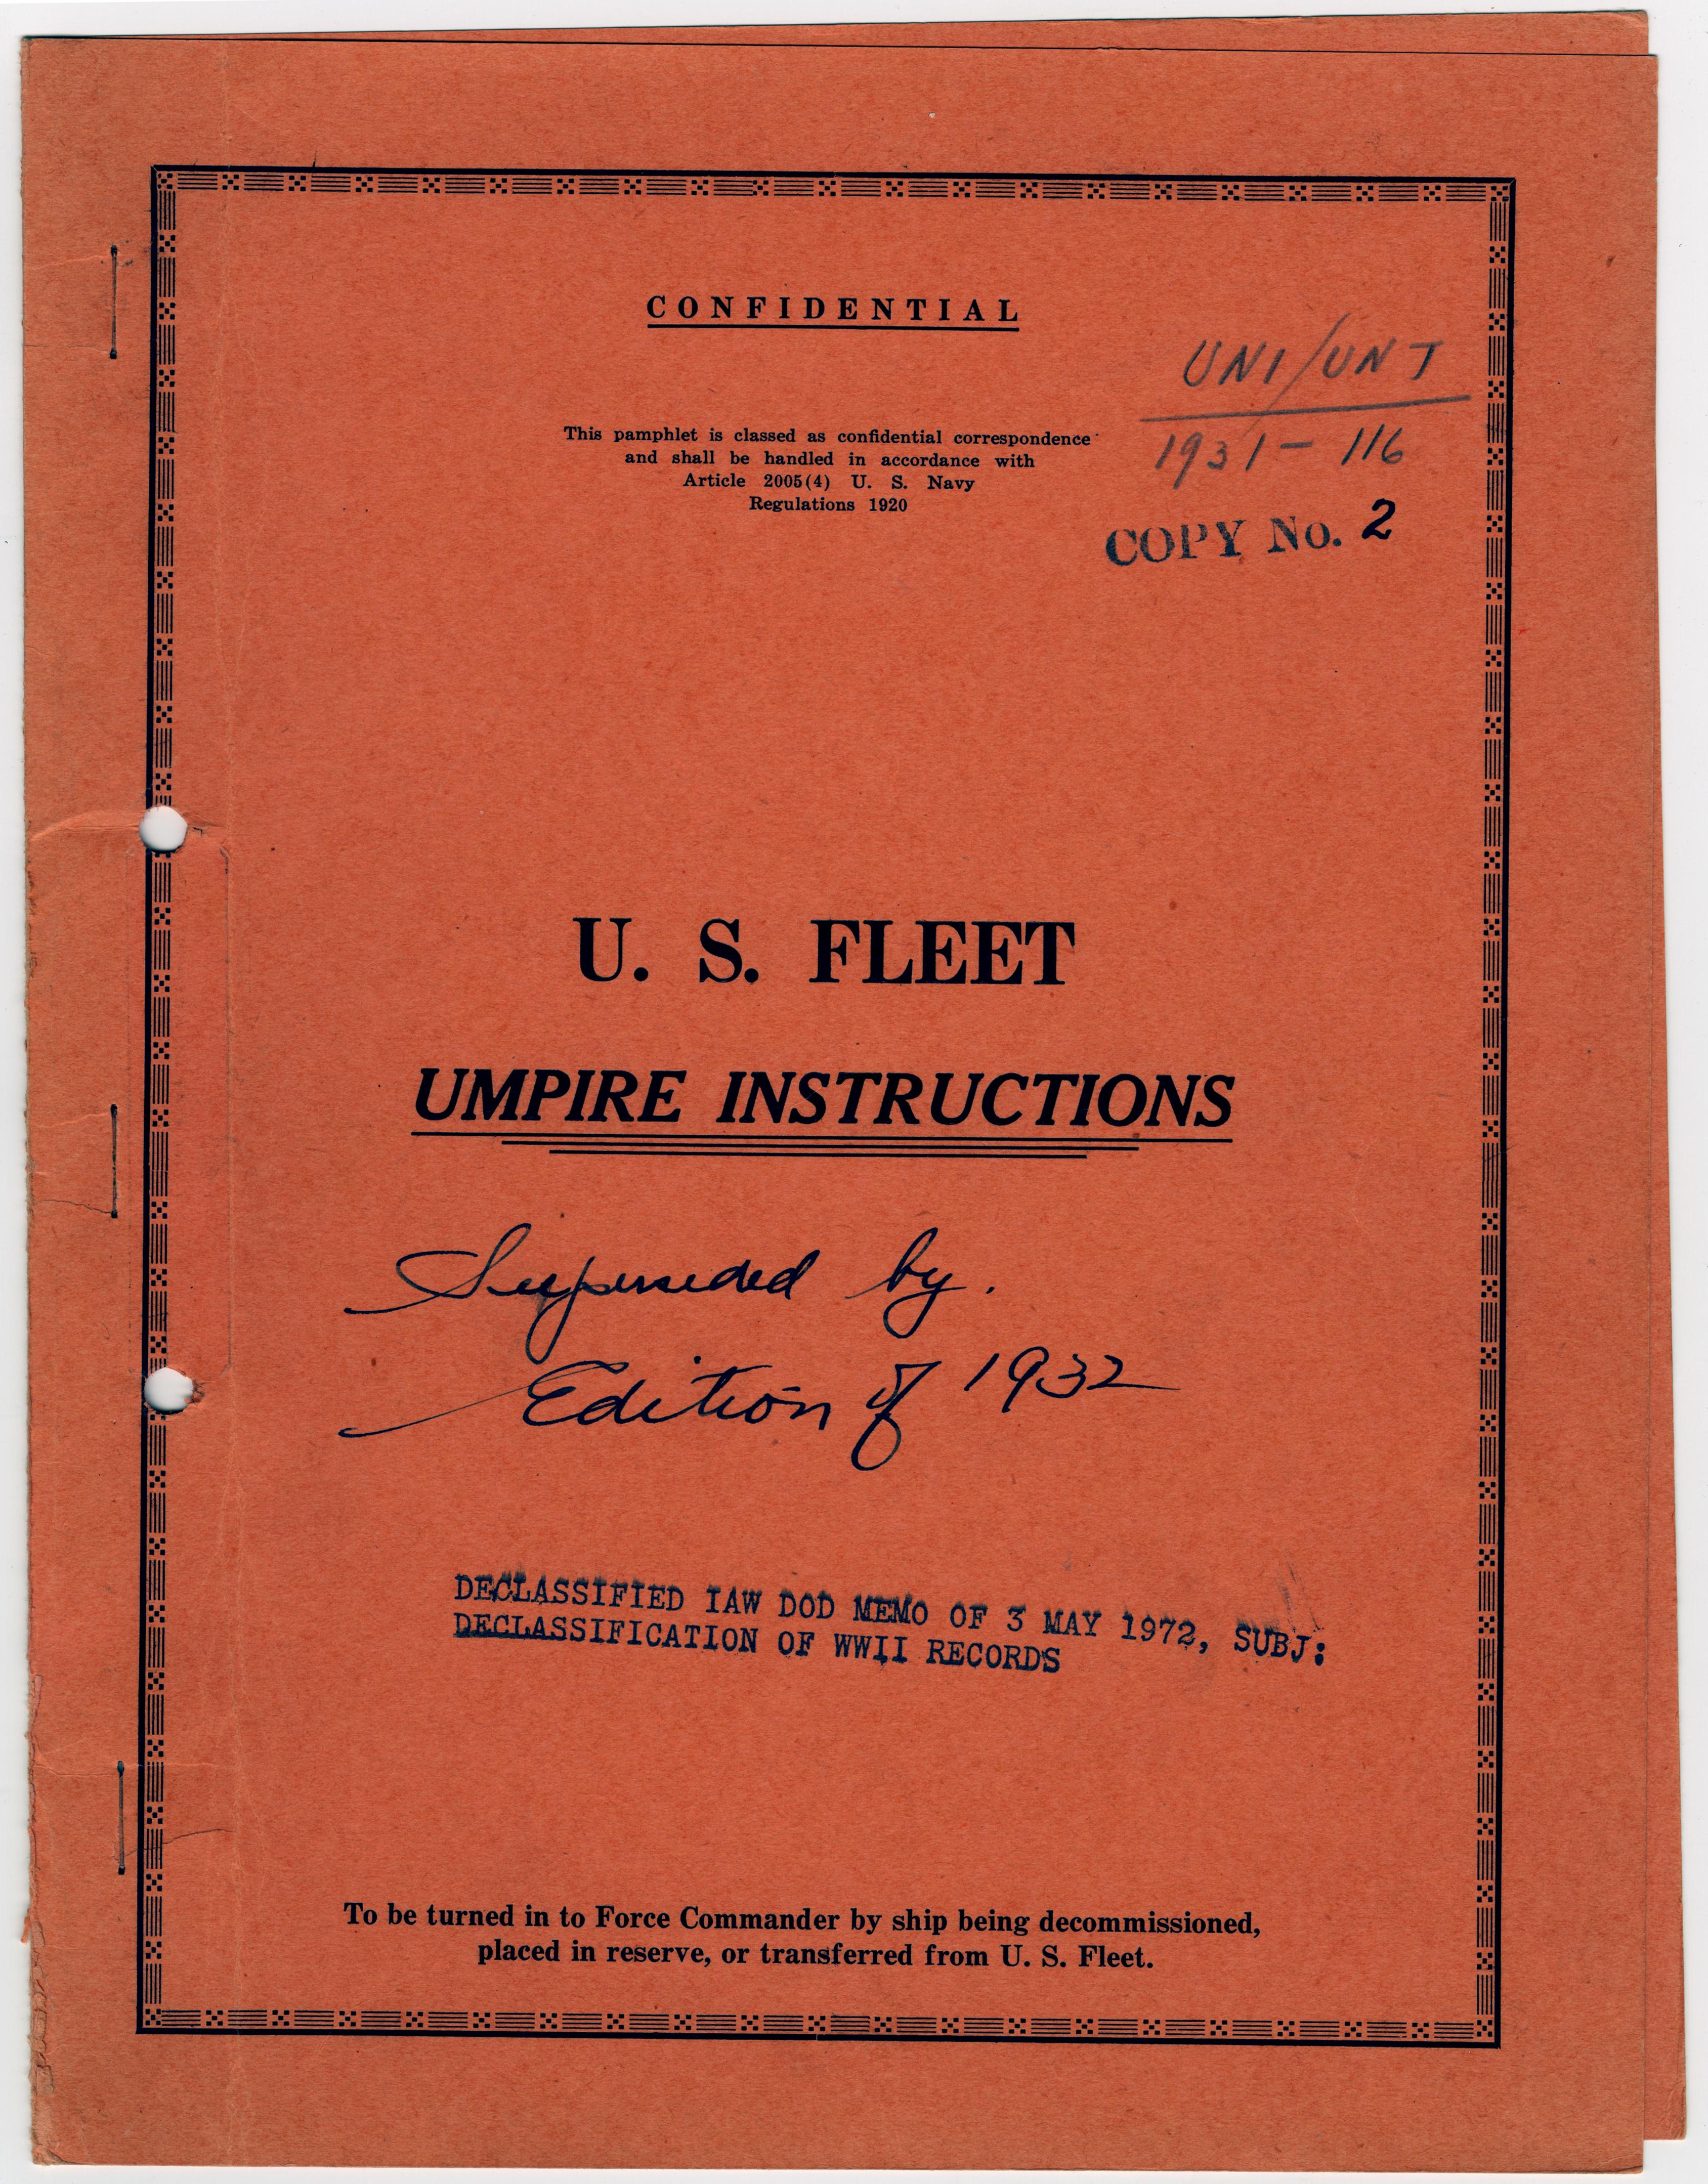 U.S. Fleet: Umpire Instructions 1931